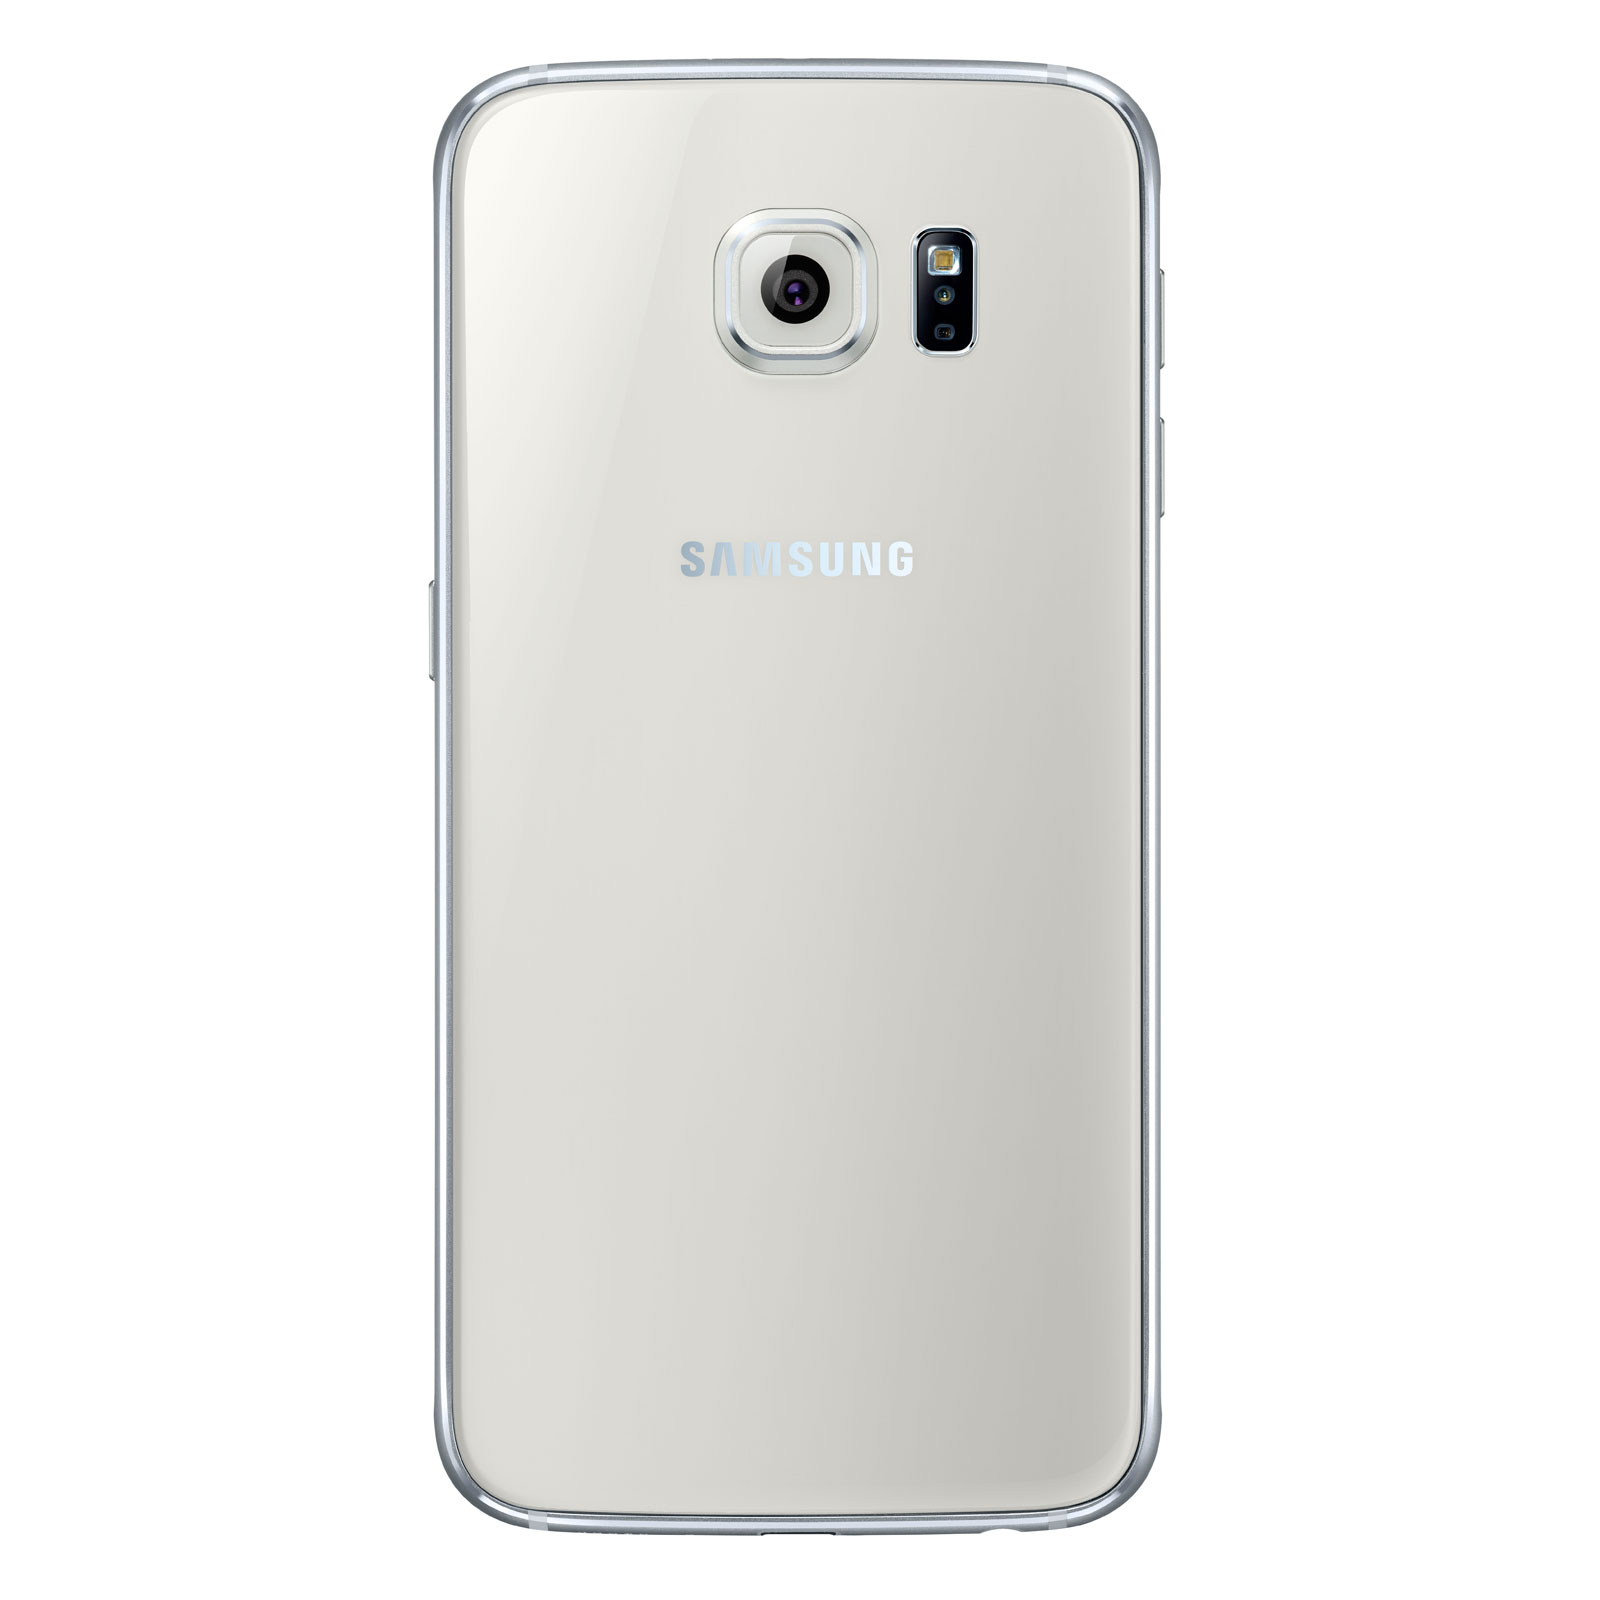 samsung galaxy s6 sm g920f blanc 32 go mobile smartphone samsung sur. Black Bedroom Furniture Sets. Home Design Ideas